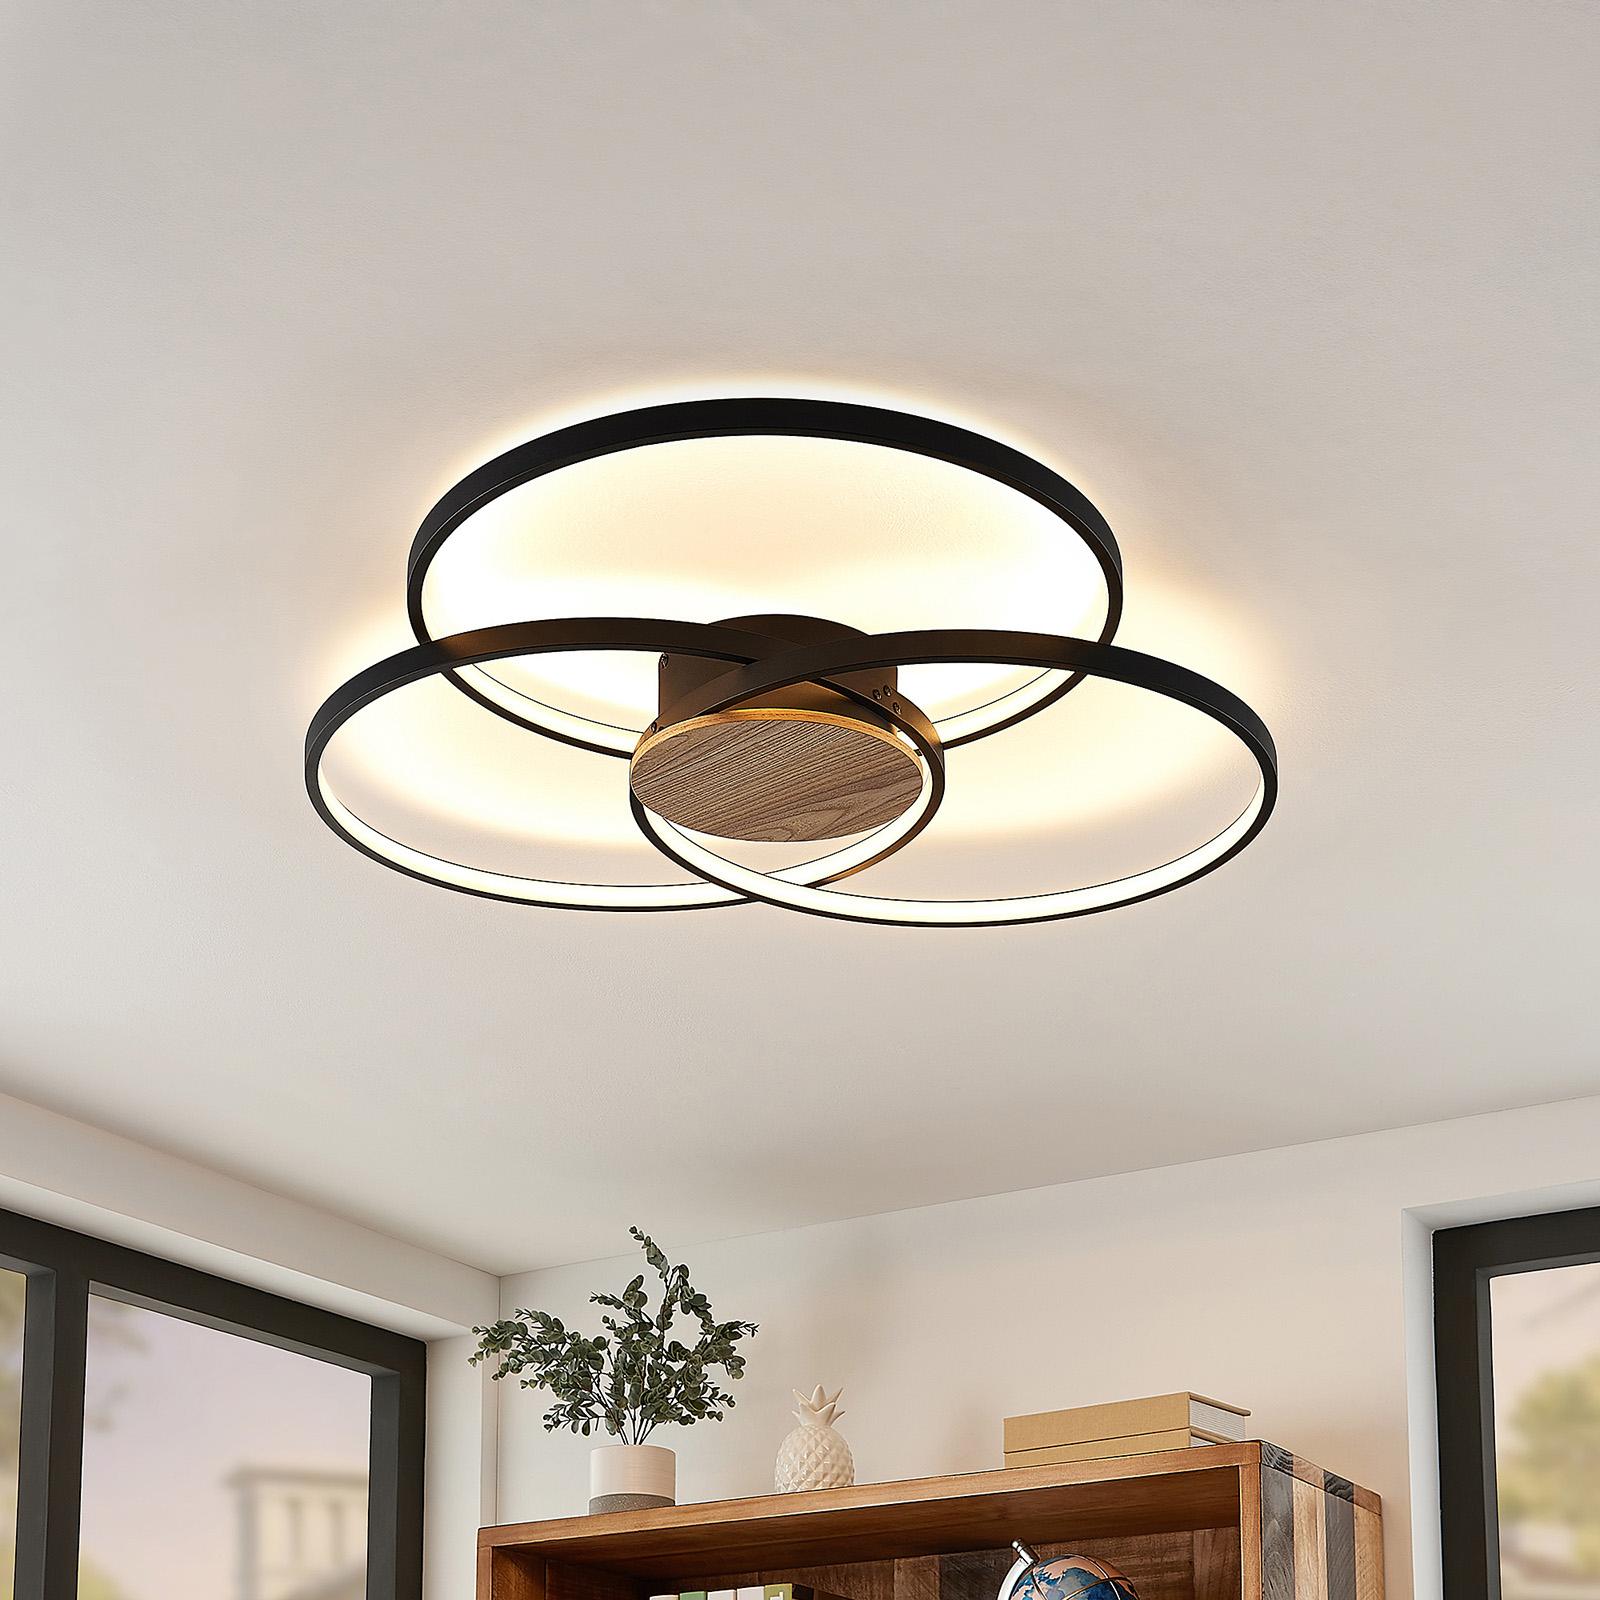 Lindby Riley lampa sufitowa LED ściemniana, czarna